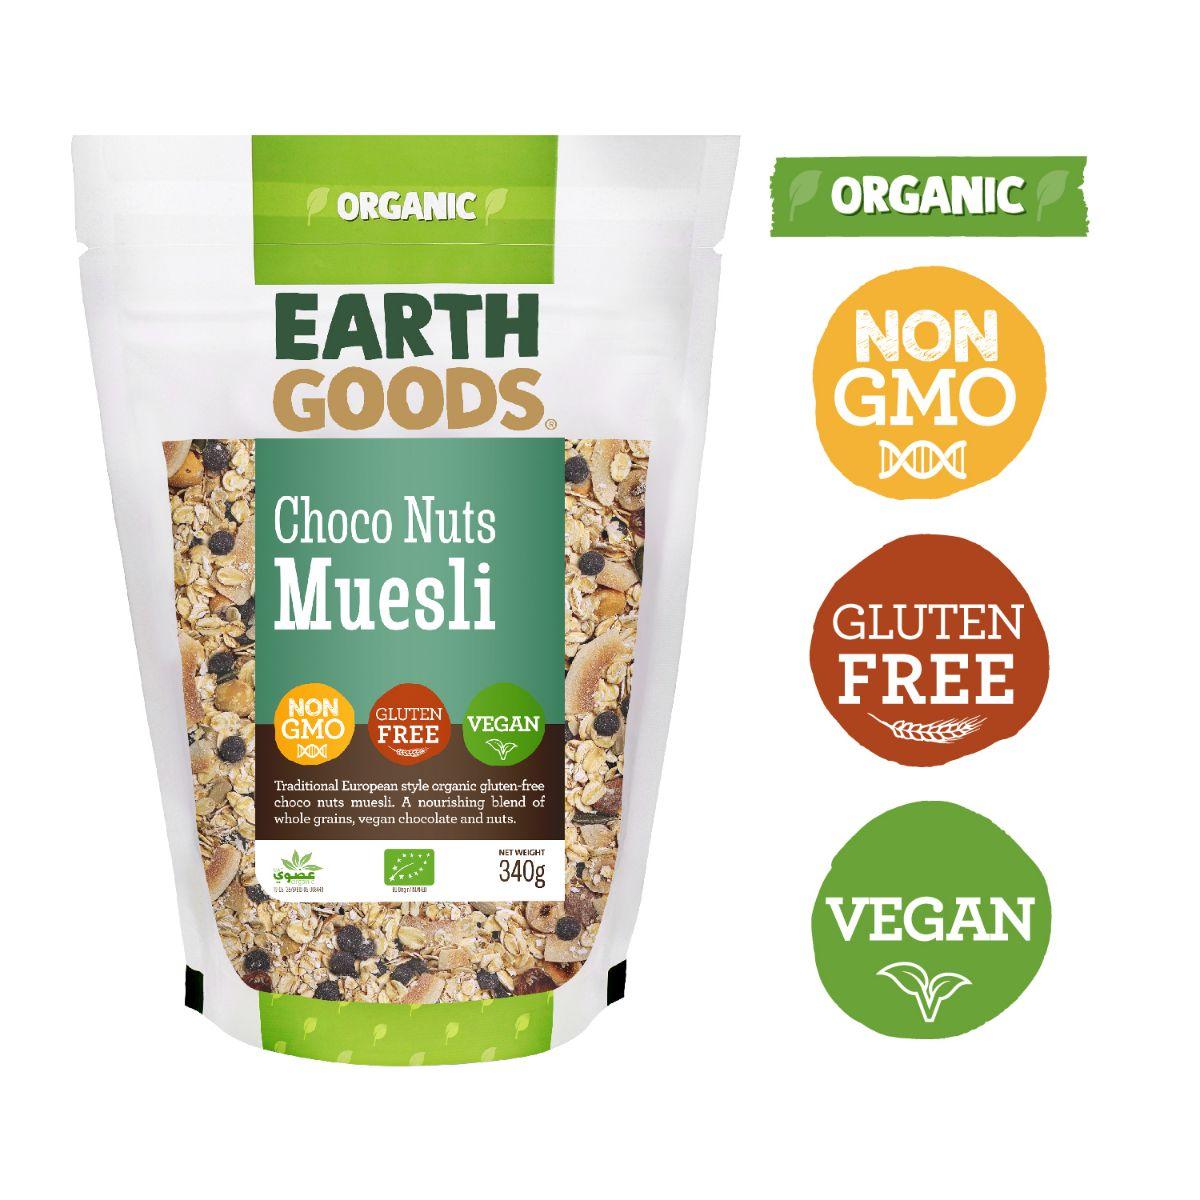 Earth Goods Organic GF Choco Nuts Muesli - 340g